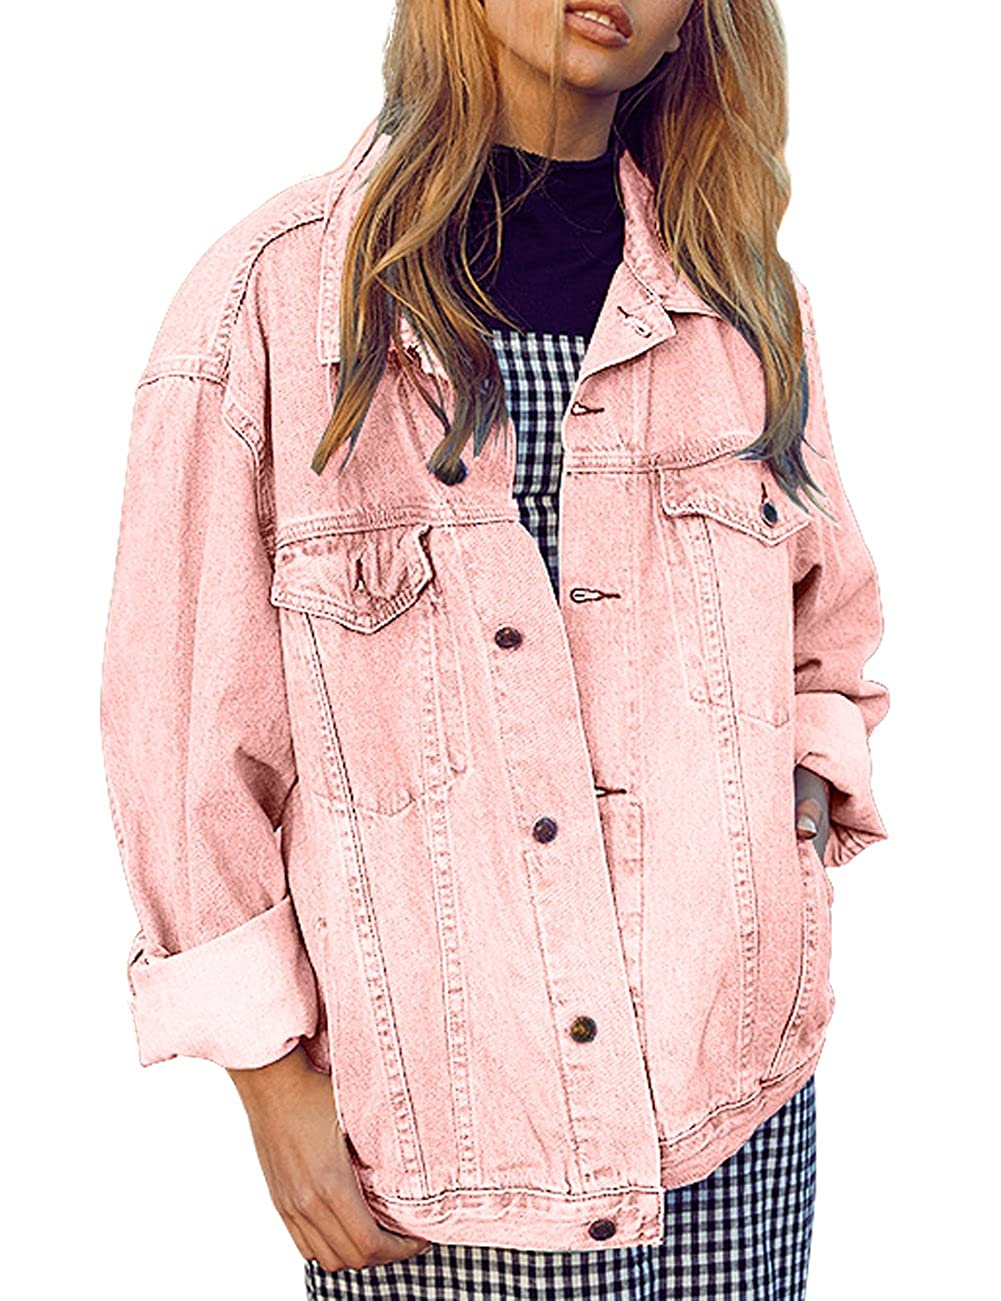 Oversized Jean Jacket Womens Vintage Washed Boyfriend Plus Size Denim Jacket